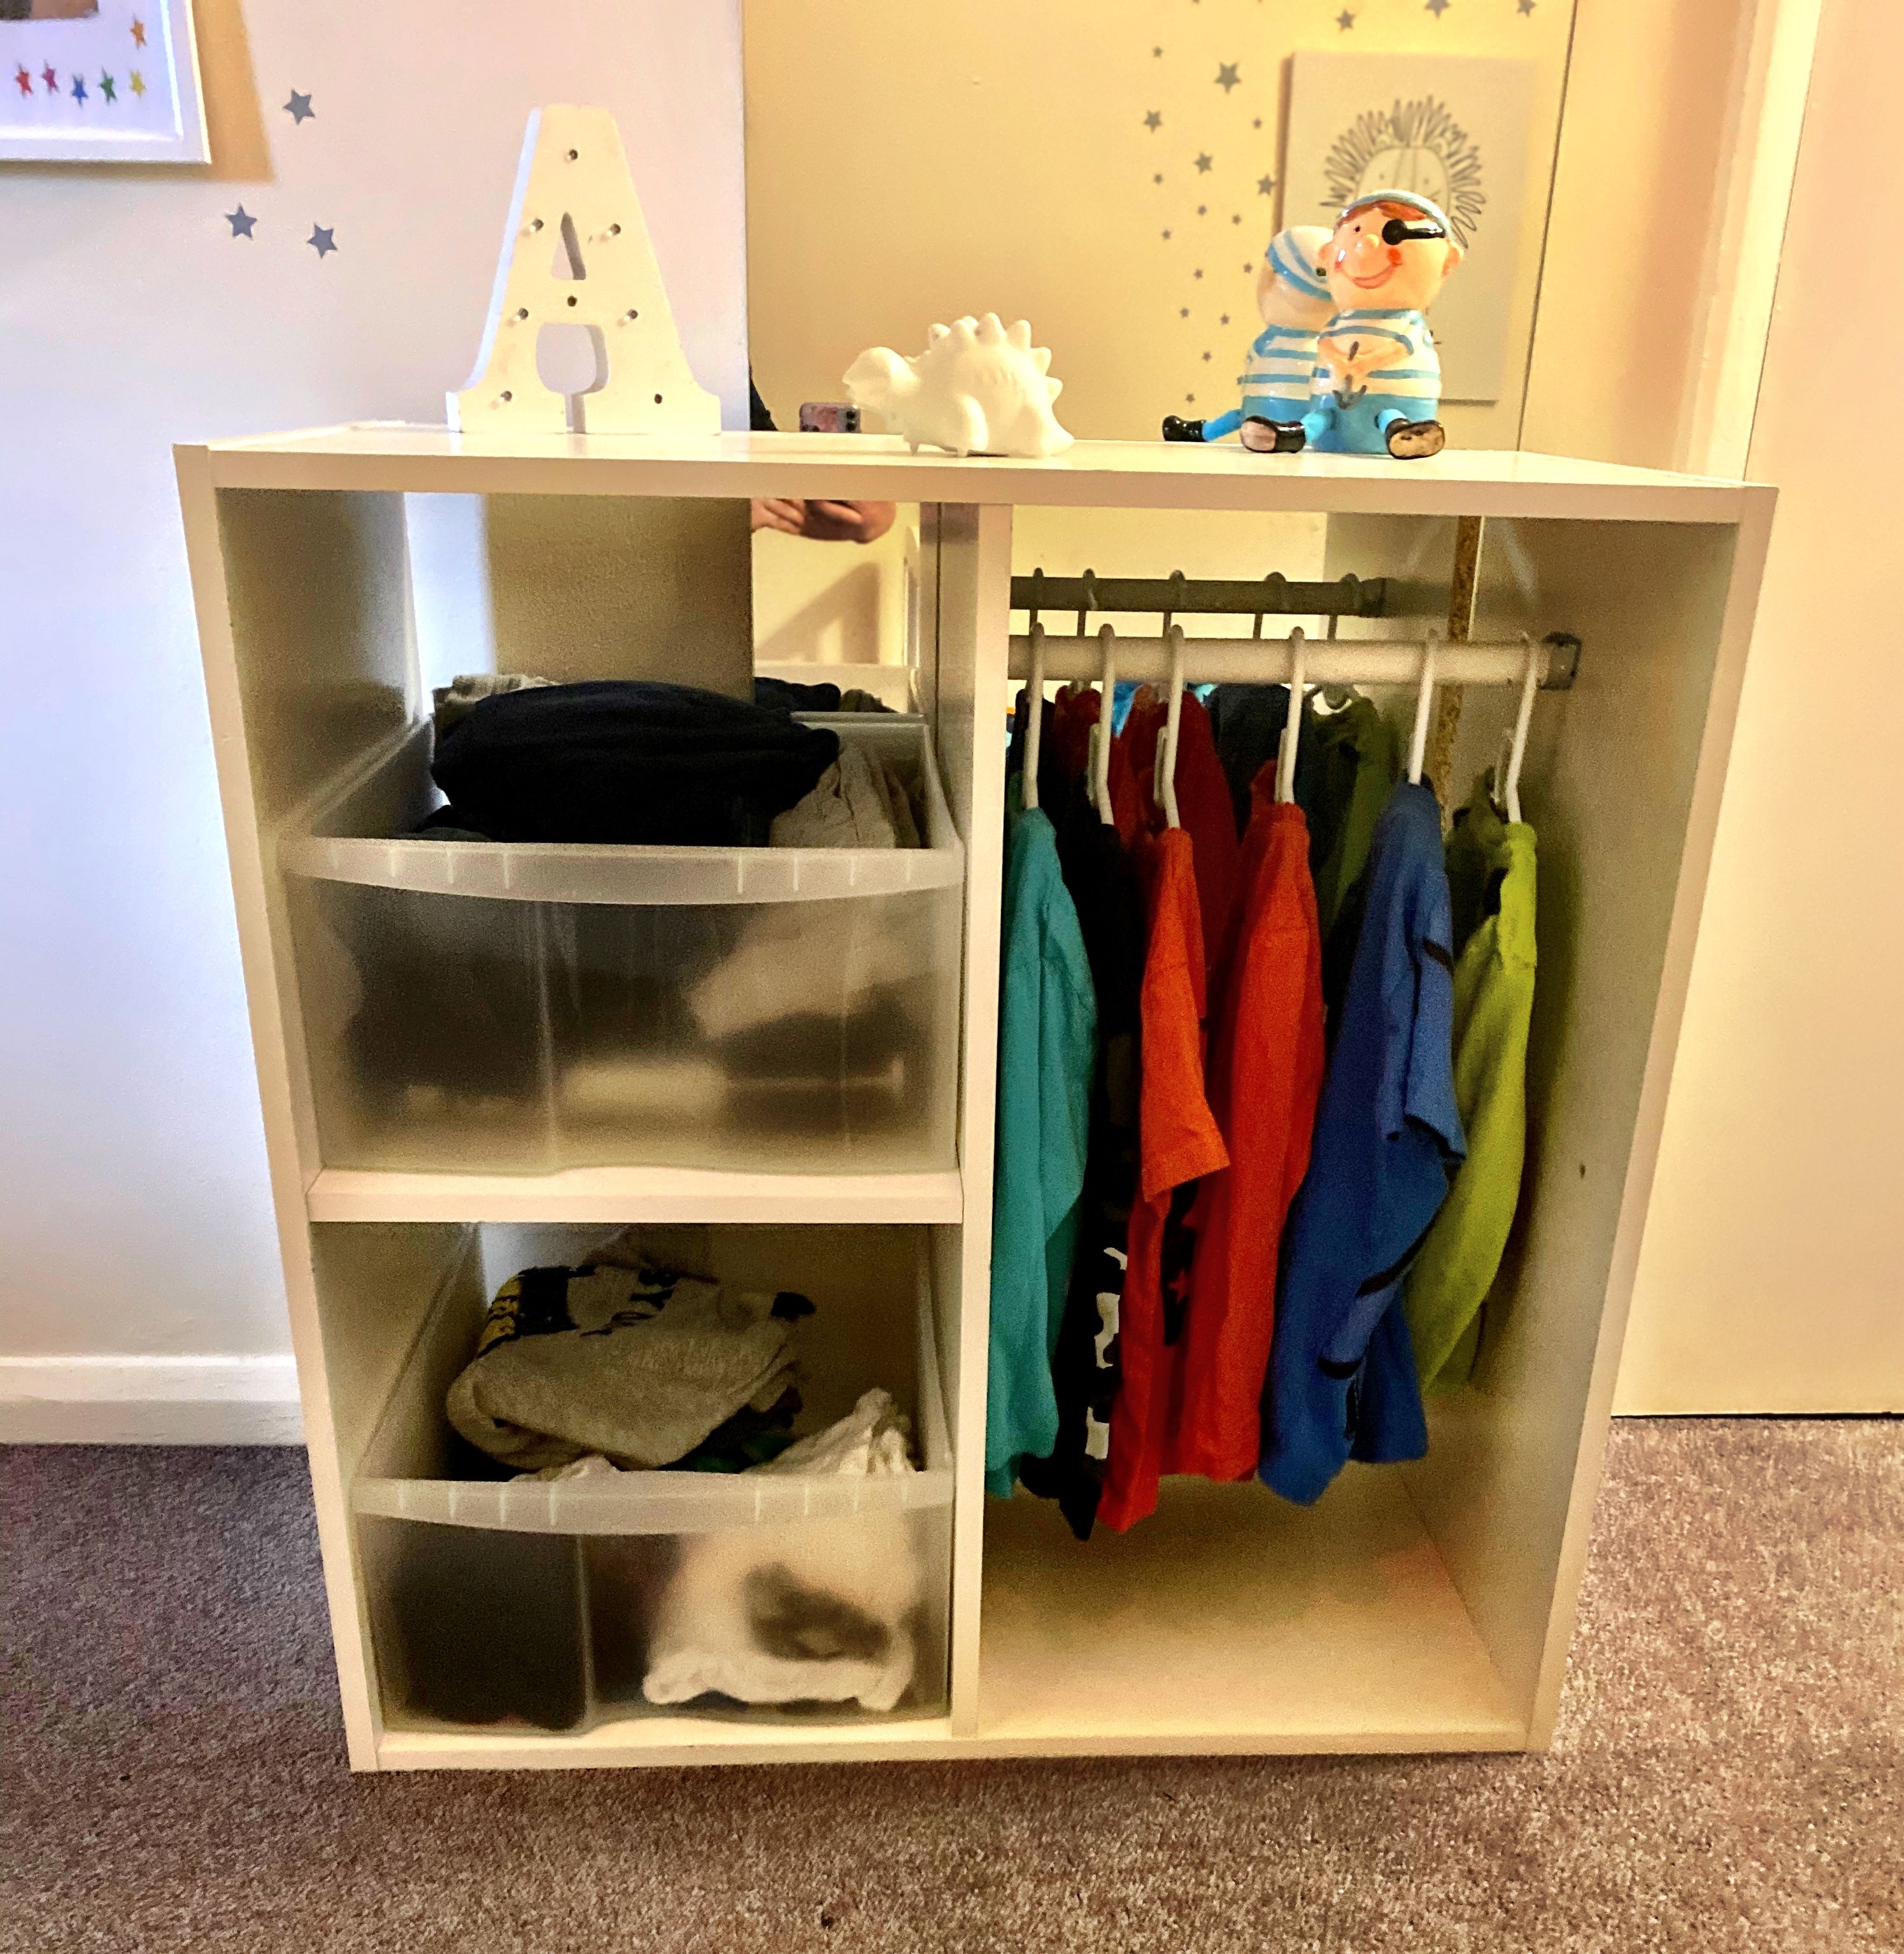 49+ Ikea hack doll closet ideas in 2021